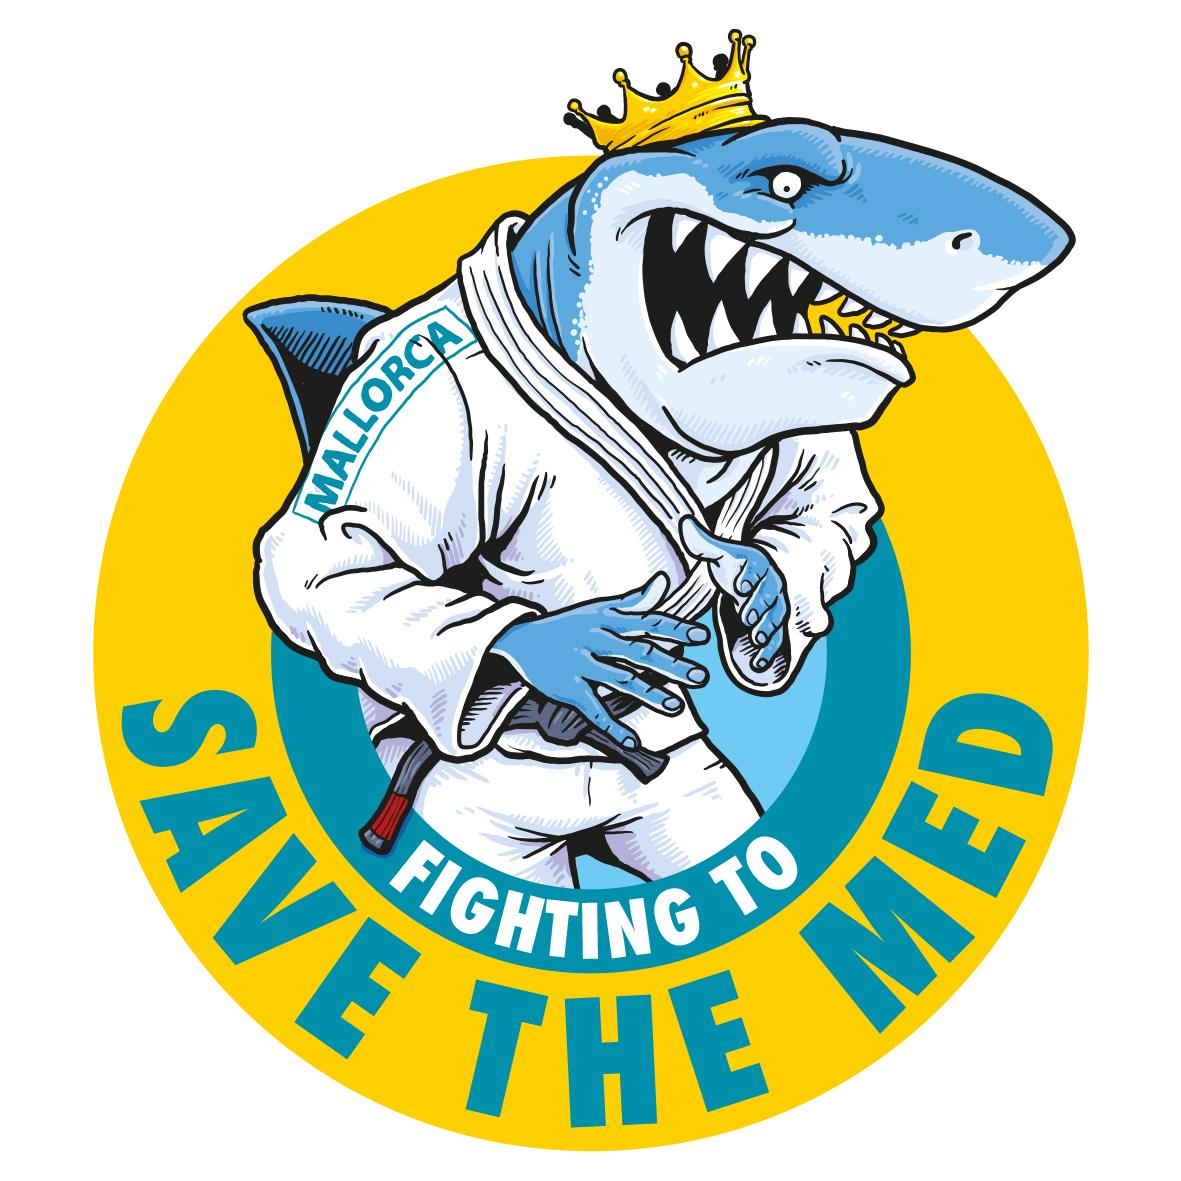 Cartoon of a shark wearing a jujitsu gi